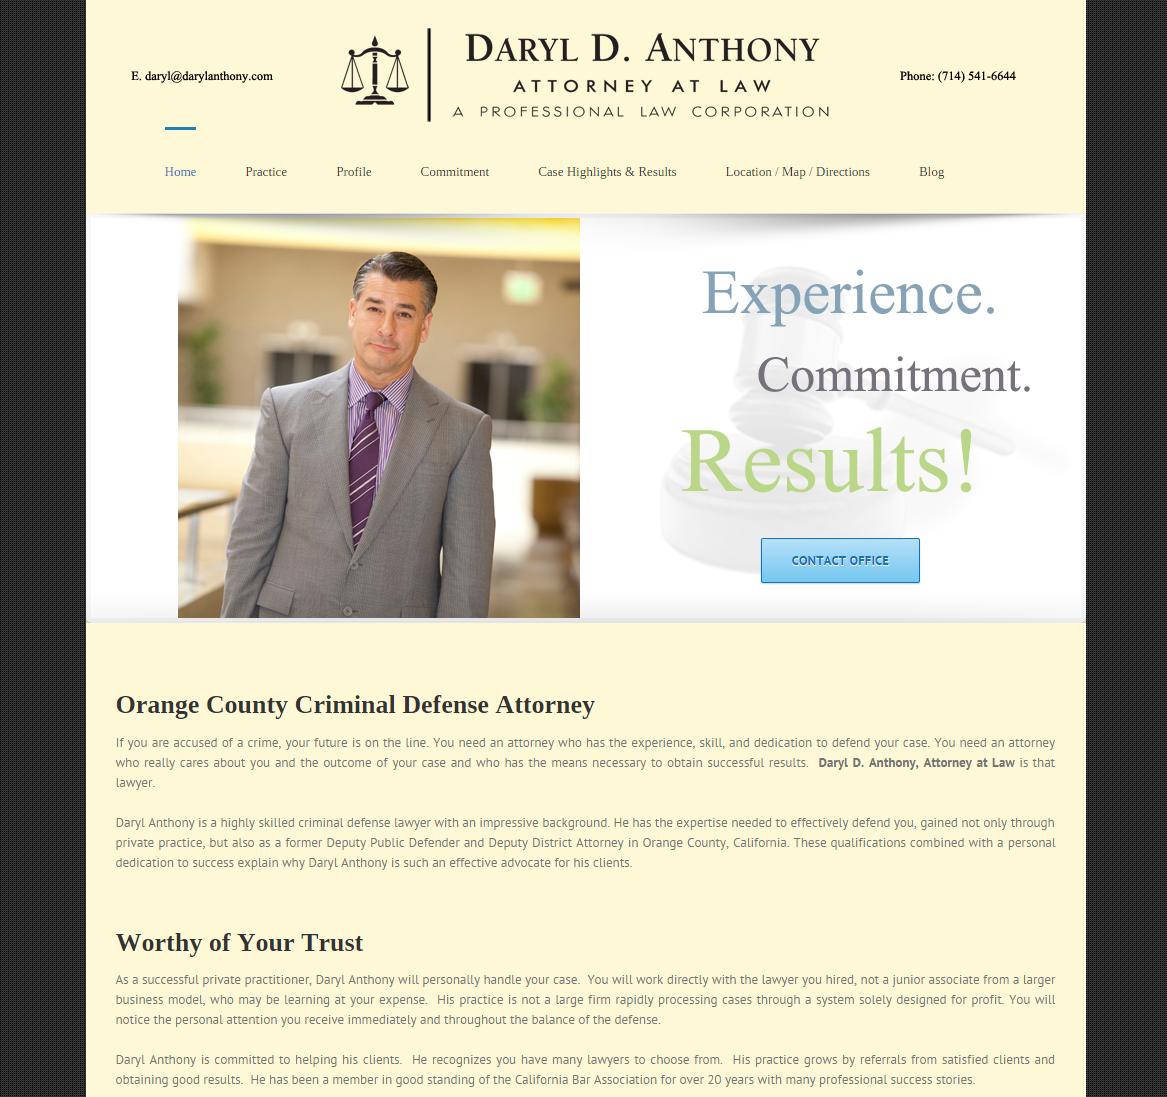 DarylAnthony.com